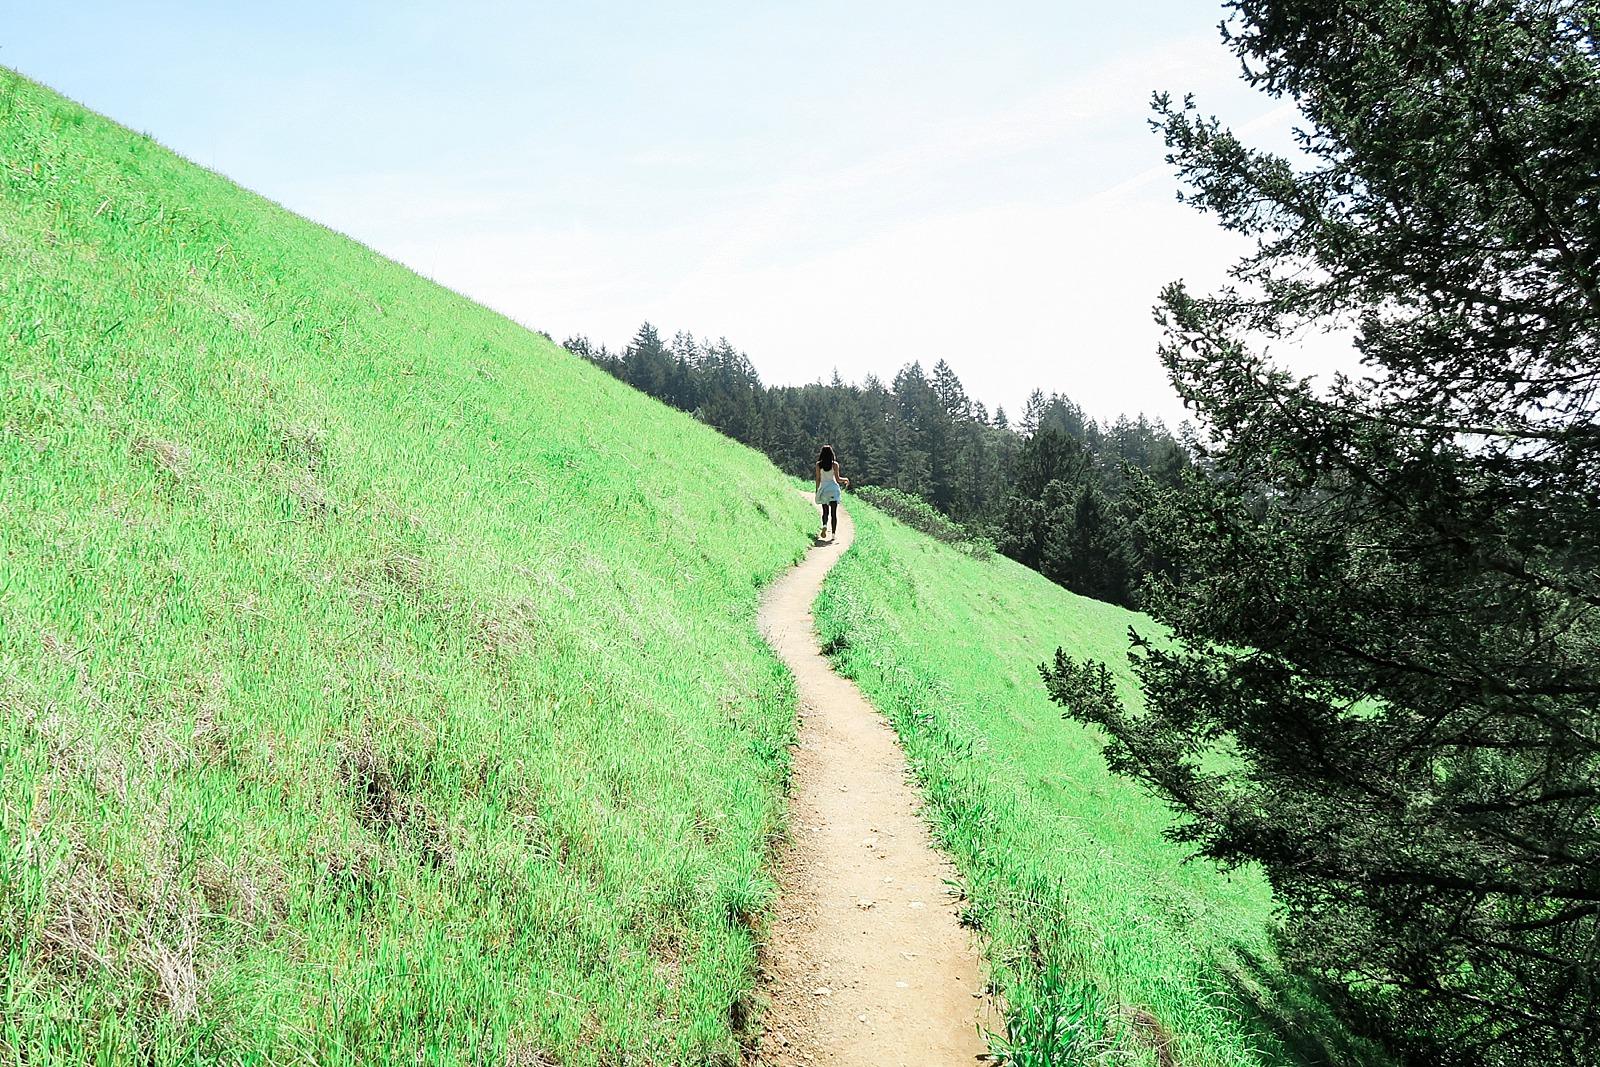 diana-elizabeth-blog-lifestyle-scotts-seed-sun-shade-lawn-games-setup-tutorial-0218